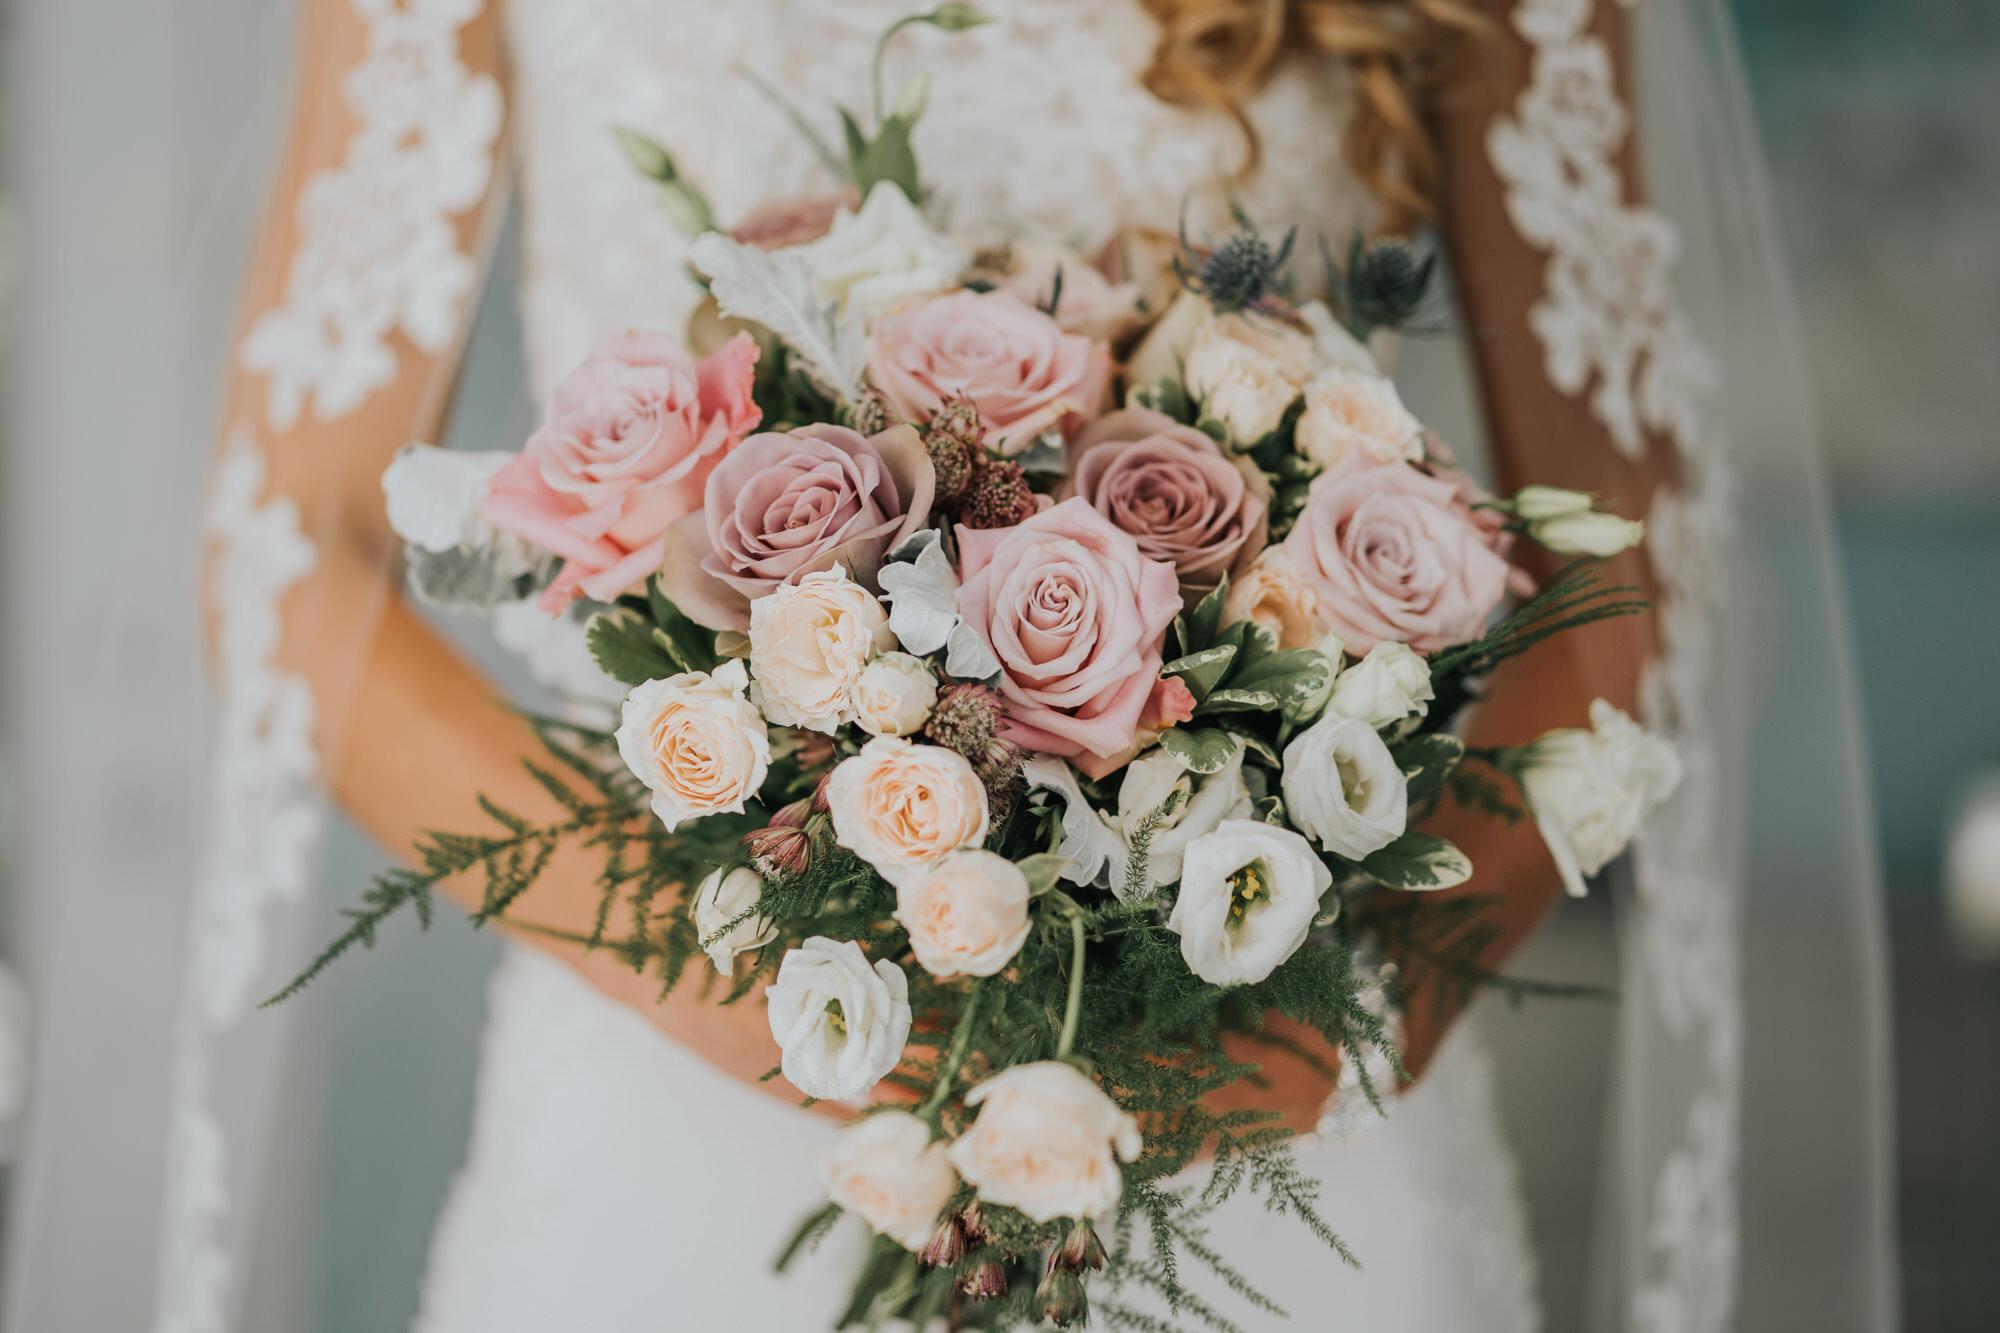 093Sean_Emily_Wedding_3-30-19.jpg